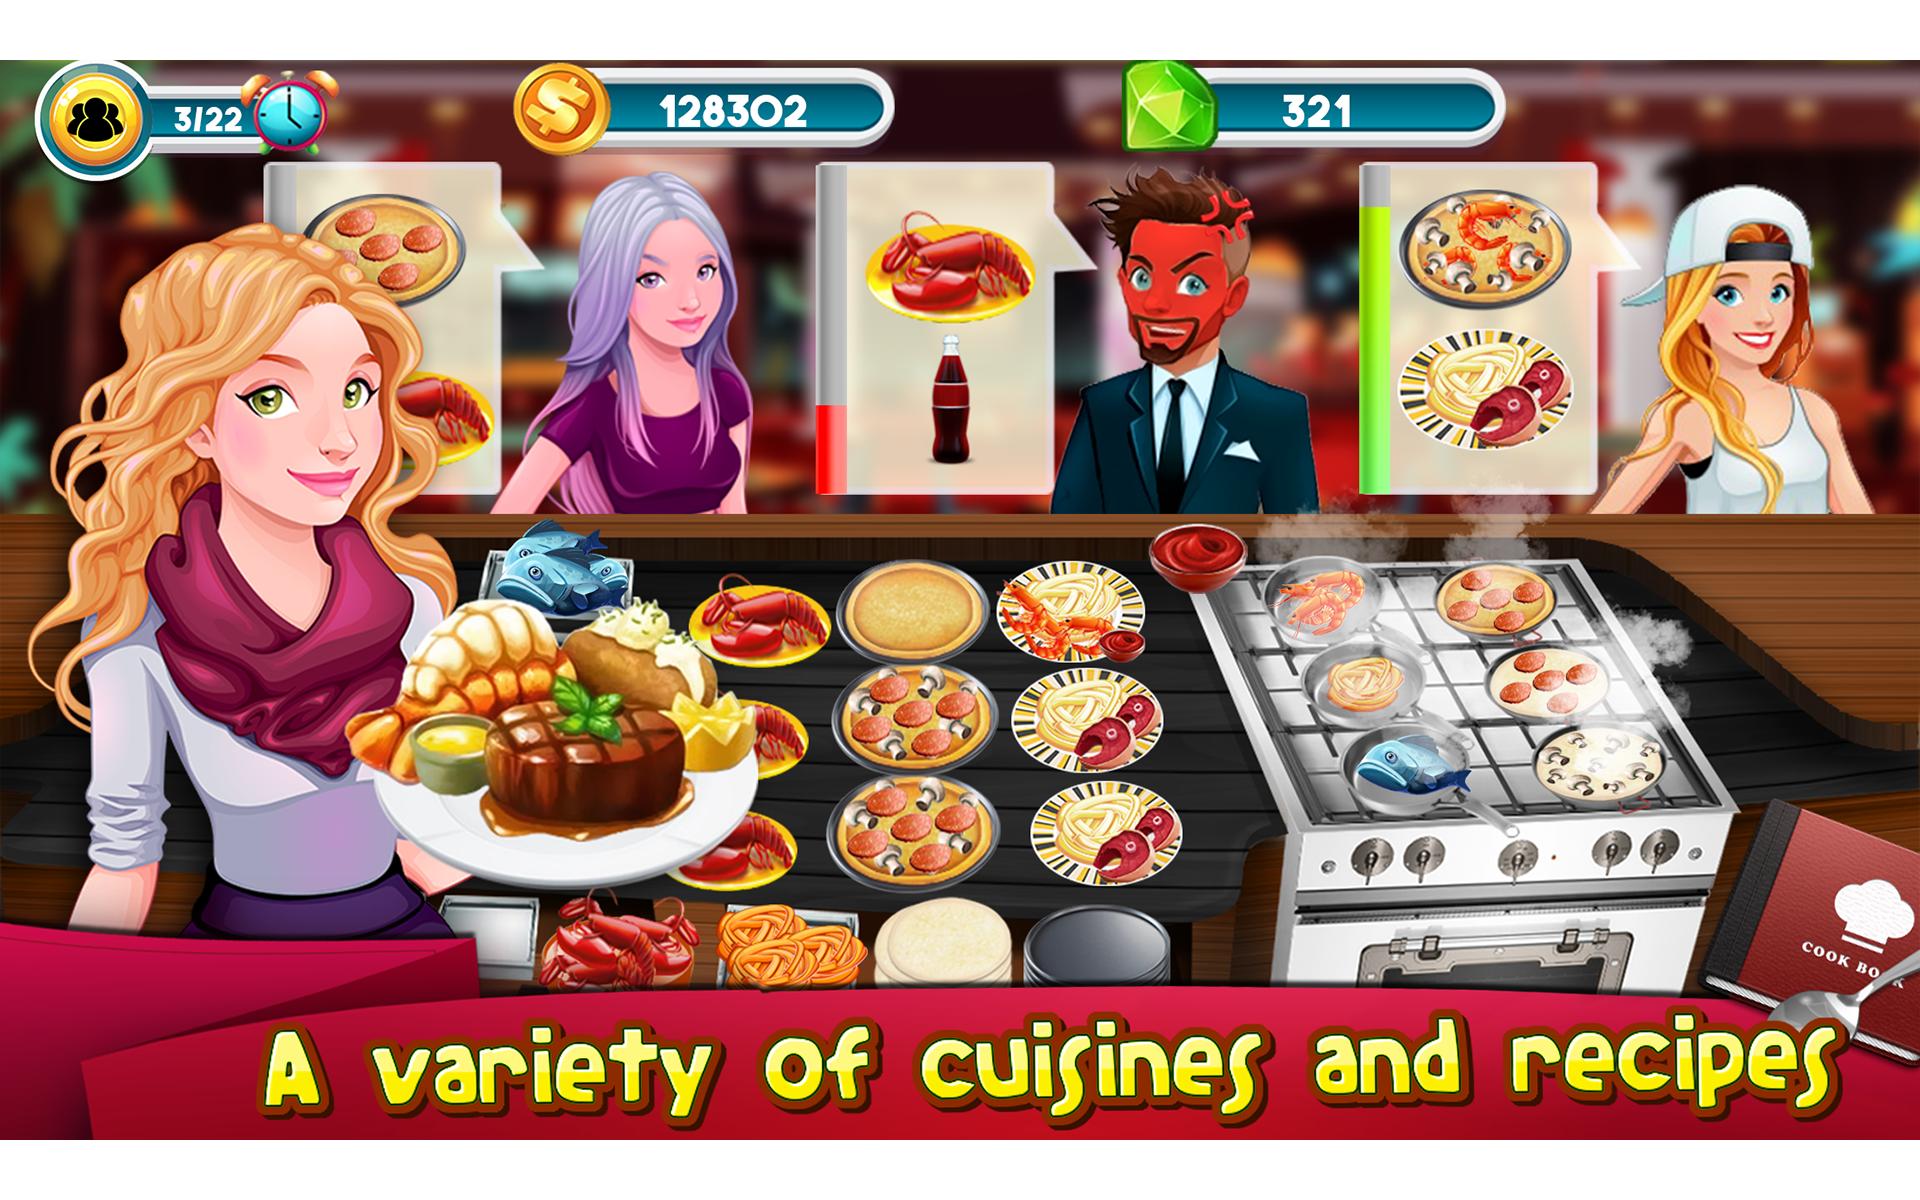 jeux de cuisine story chef restaurant d 39 affaires nourriture appstore for android. Black Bedroom Furniture Sets. Home Design Ideas